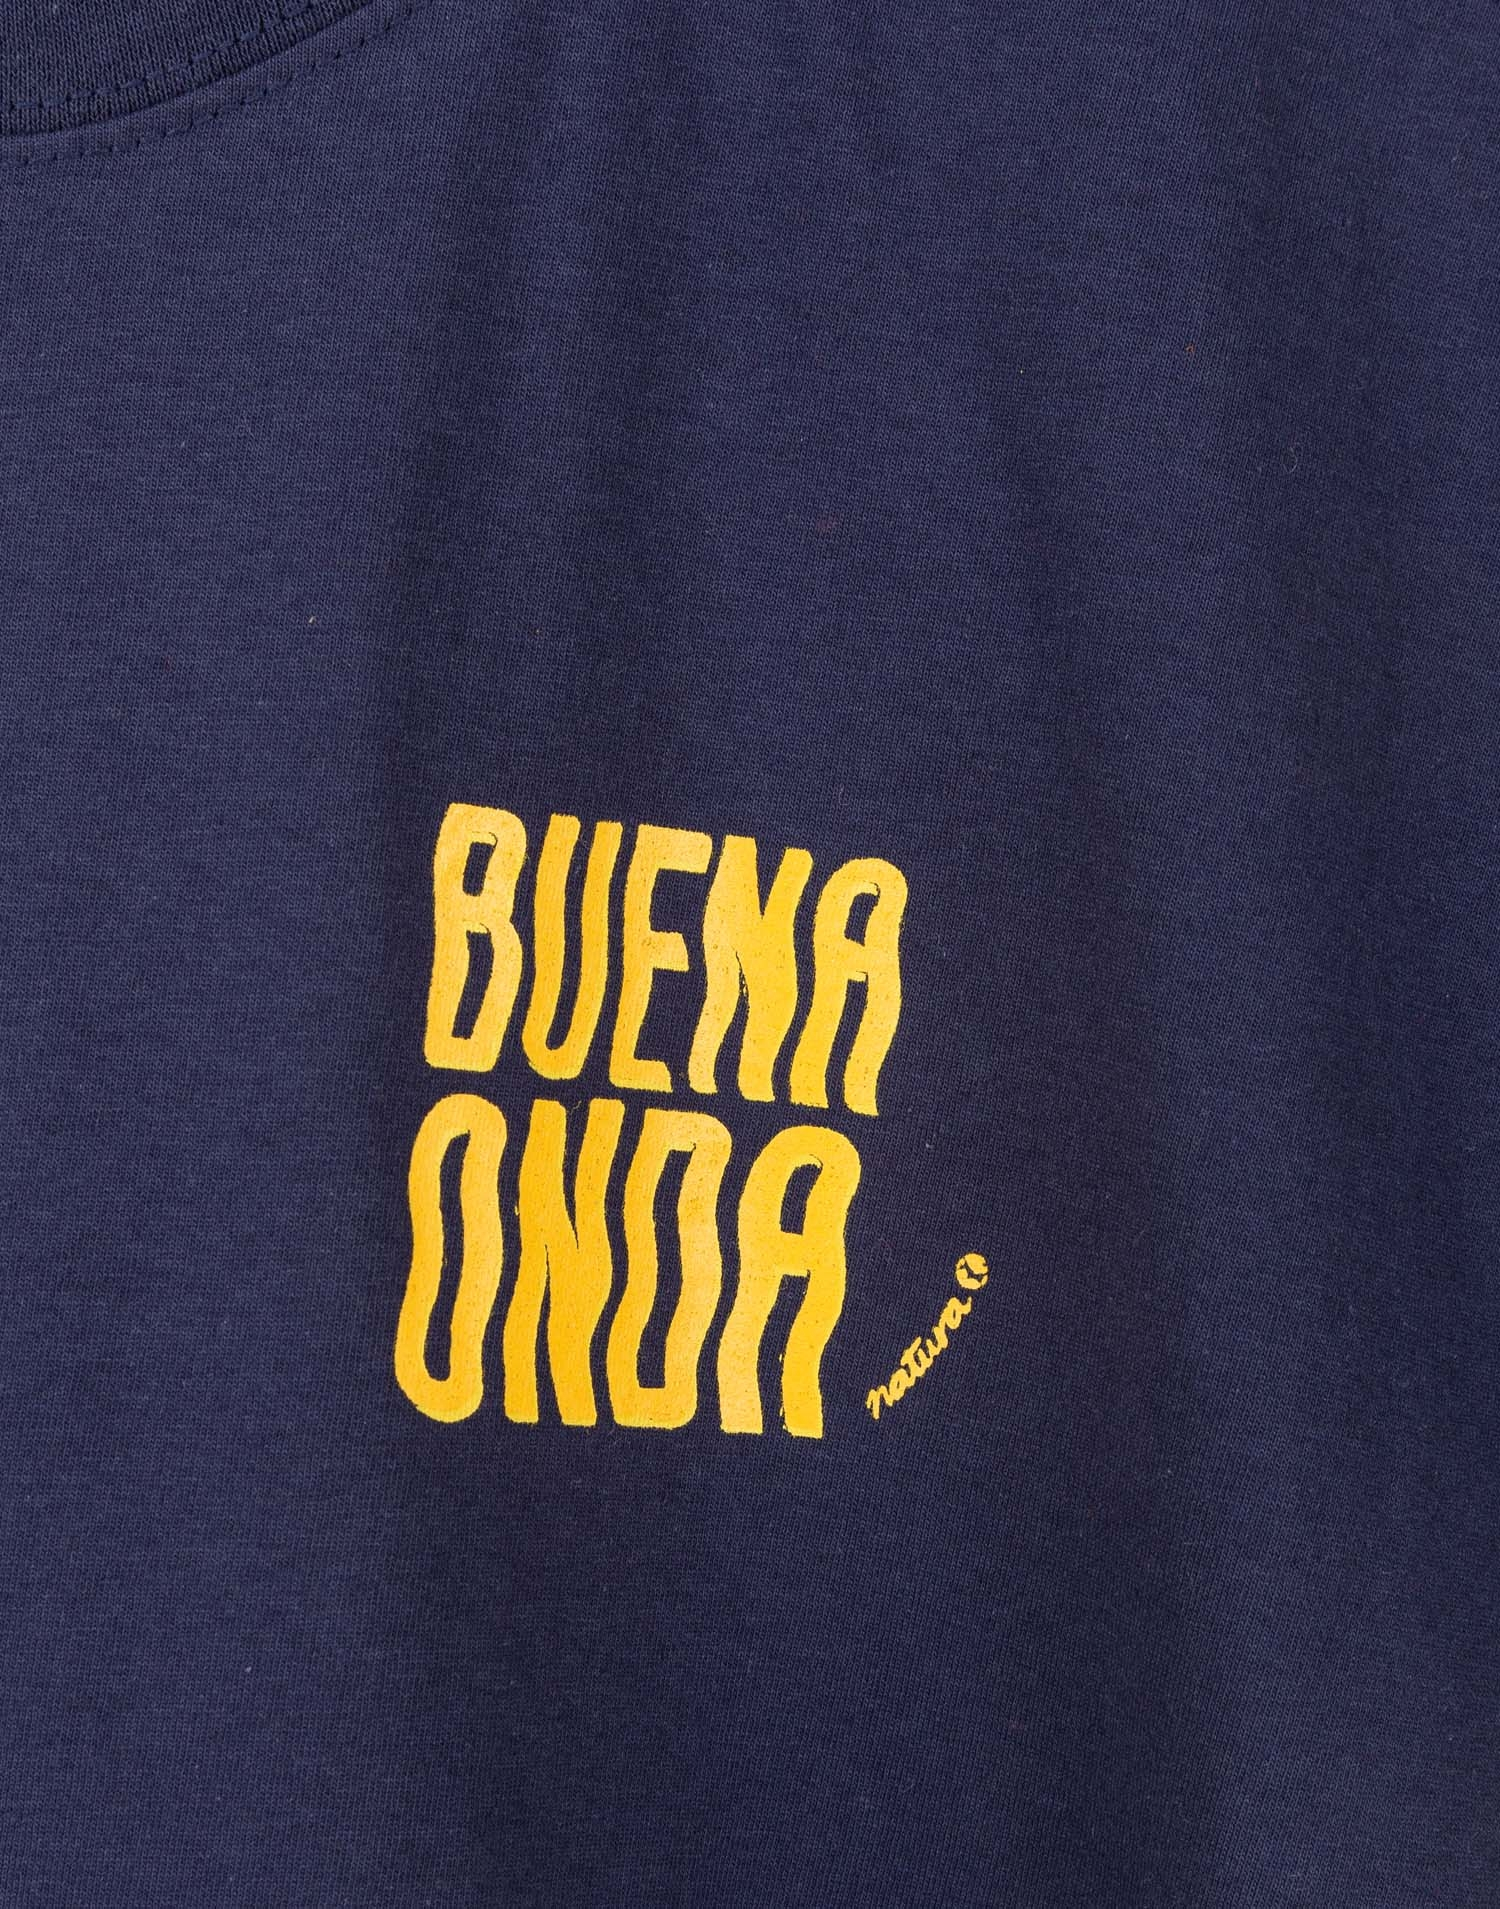 BUENA ONDA T-SHIRT